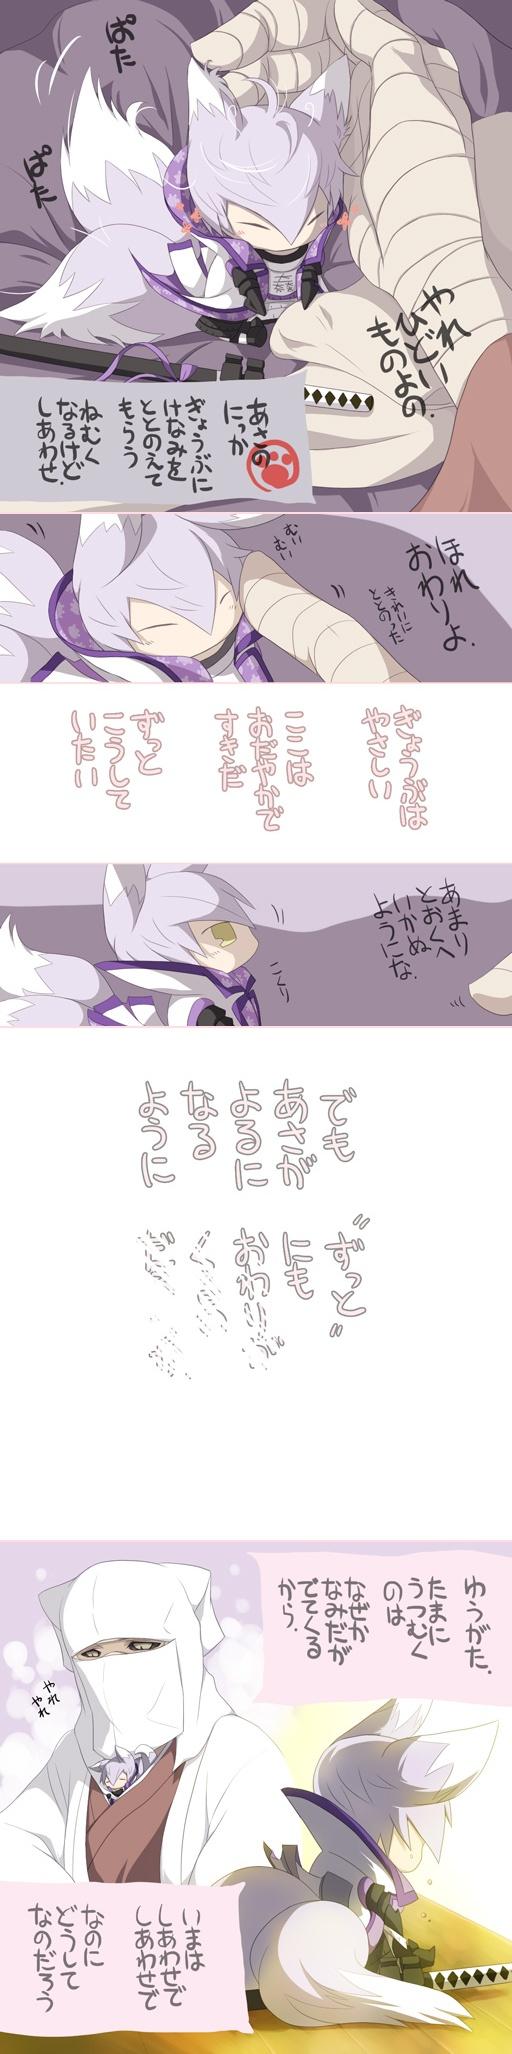 Tags: Anime, Qigu (Artist), Sengoku Basara, Ishida Mitsunari (Sengoku Basara), Devil Kings